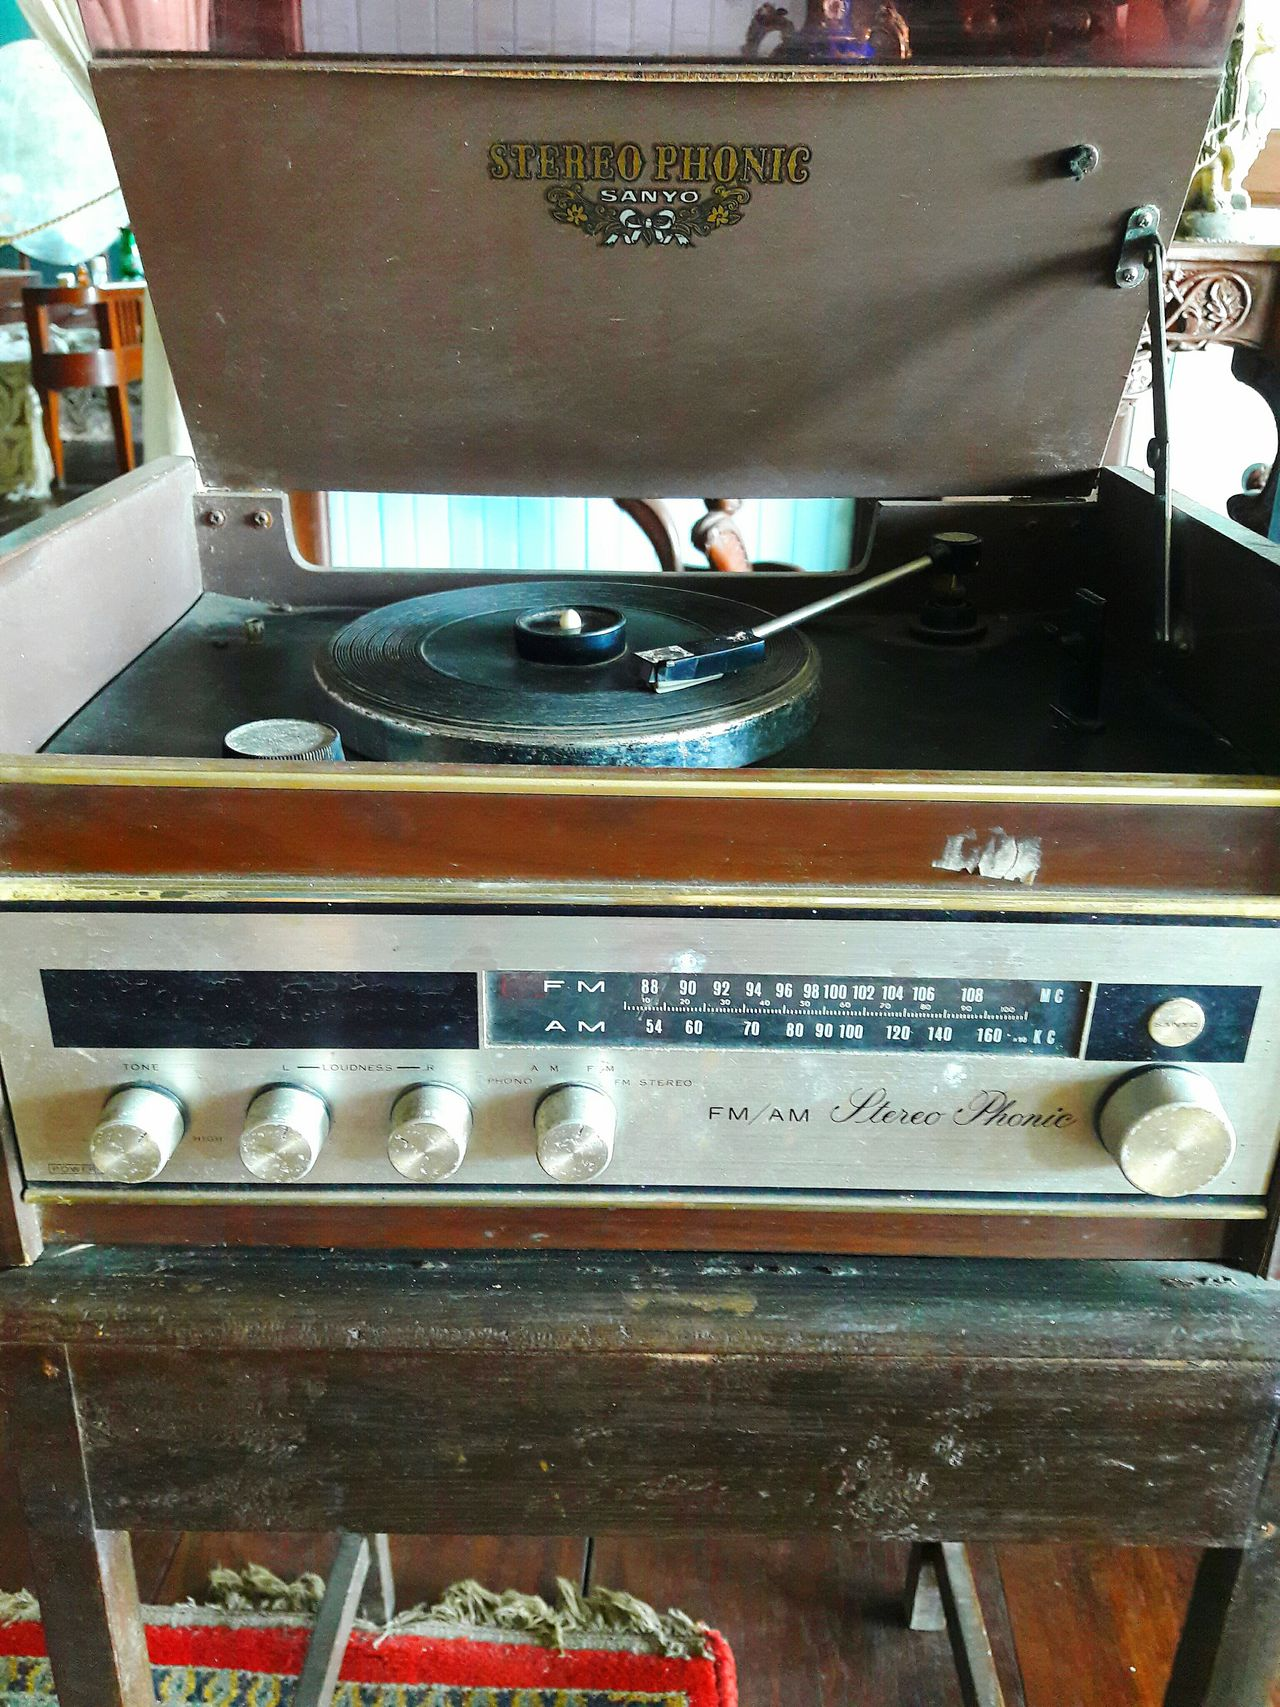 Radio. Music Antique Music Turntable Indoors  Old-fashioned